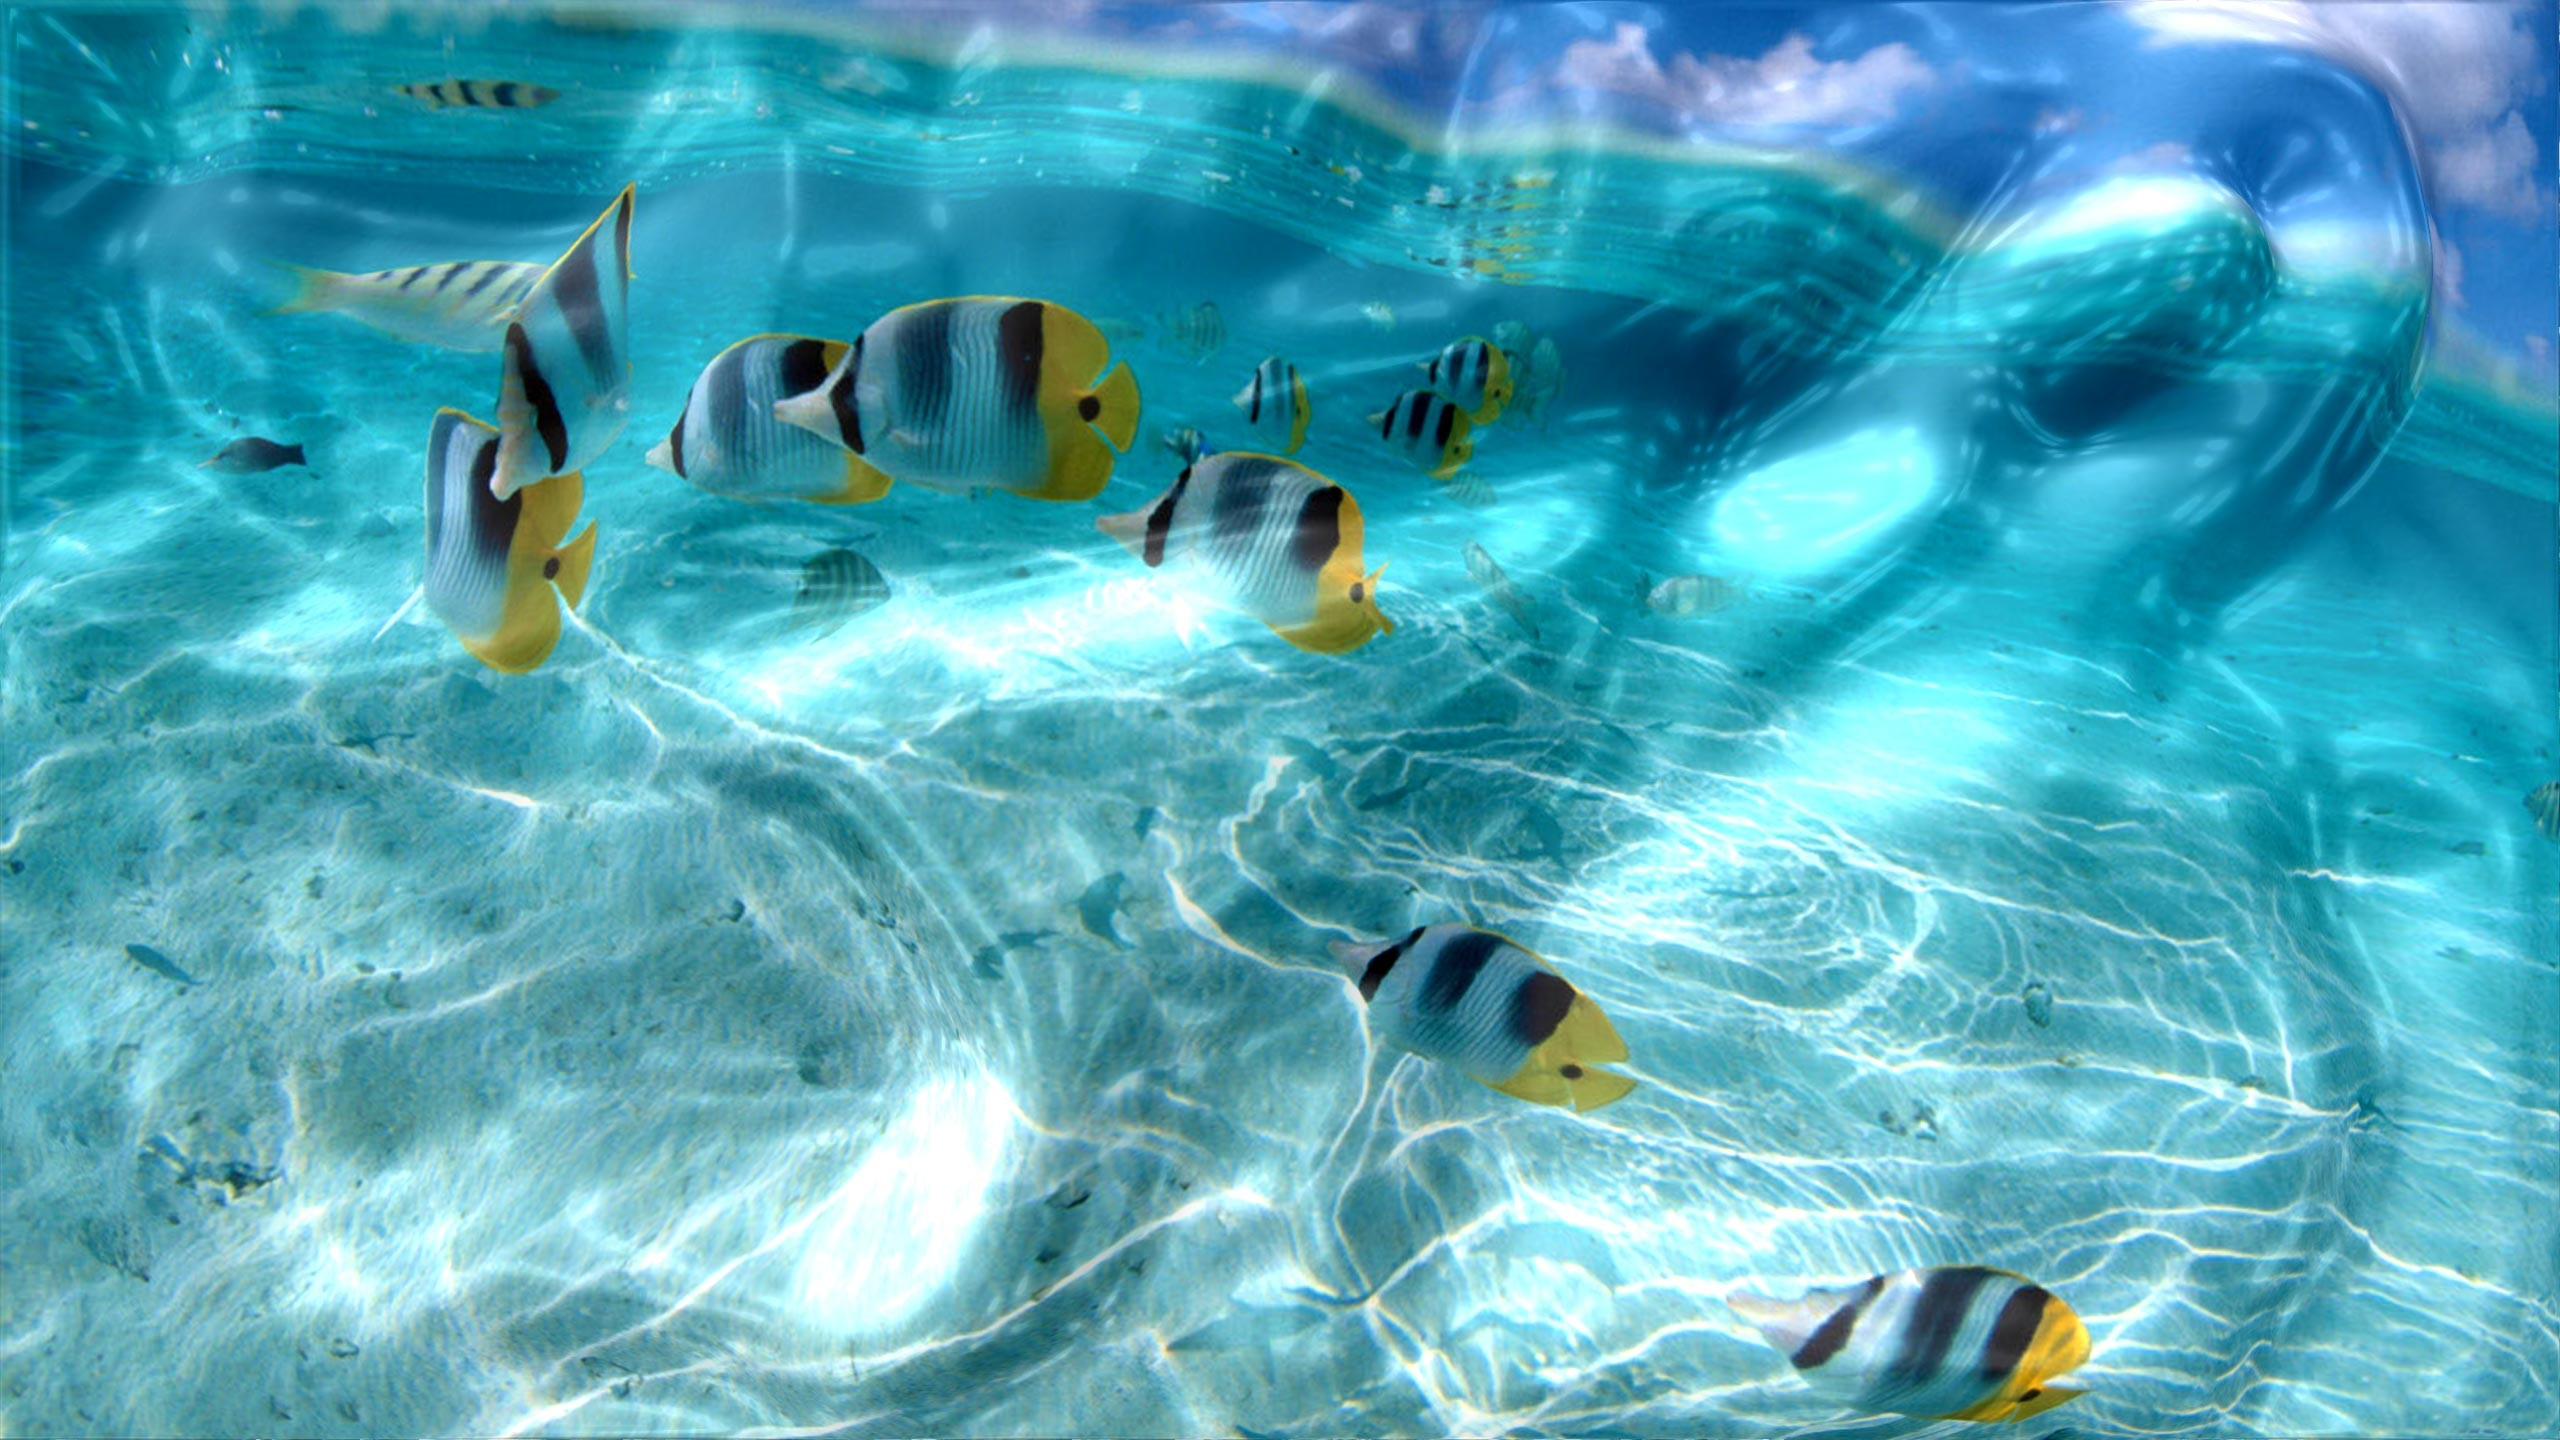 Watery Desktop 3D